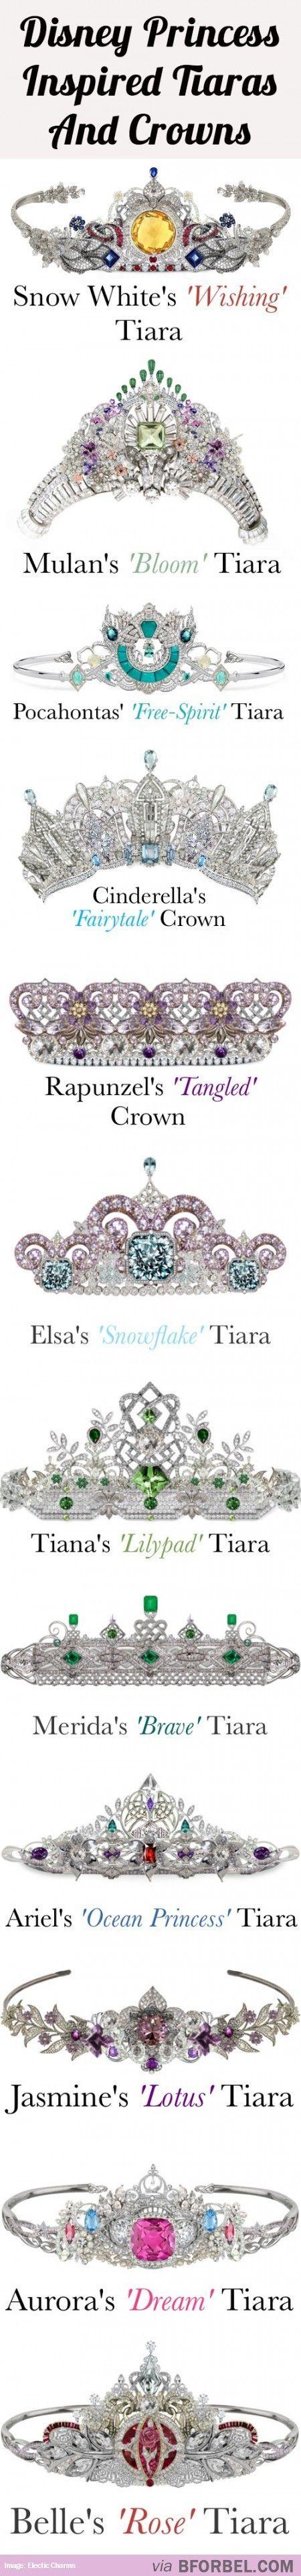 12 Disney Princess Tiaras And Crowns… Like this.